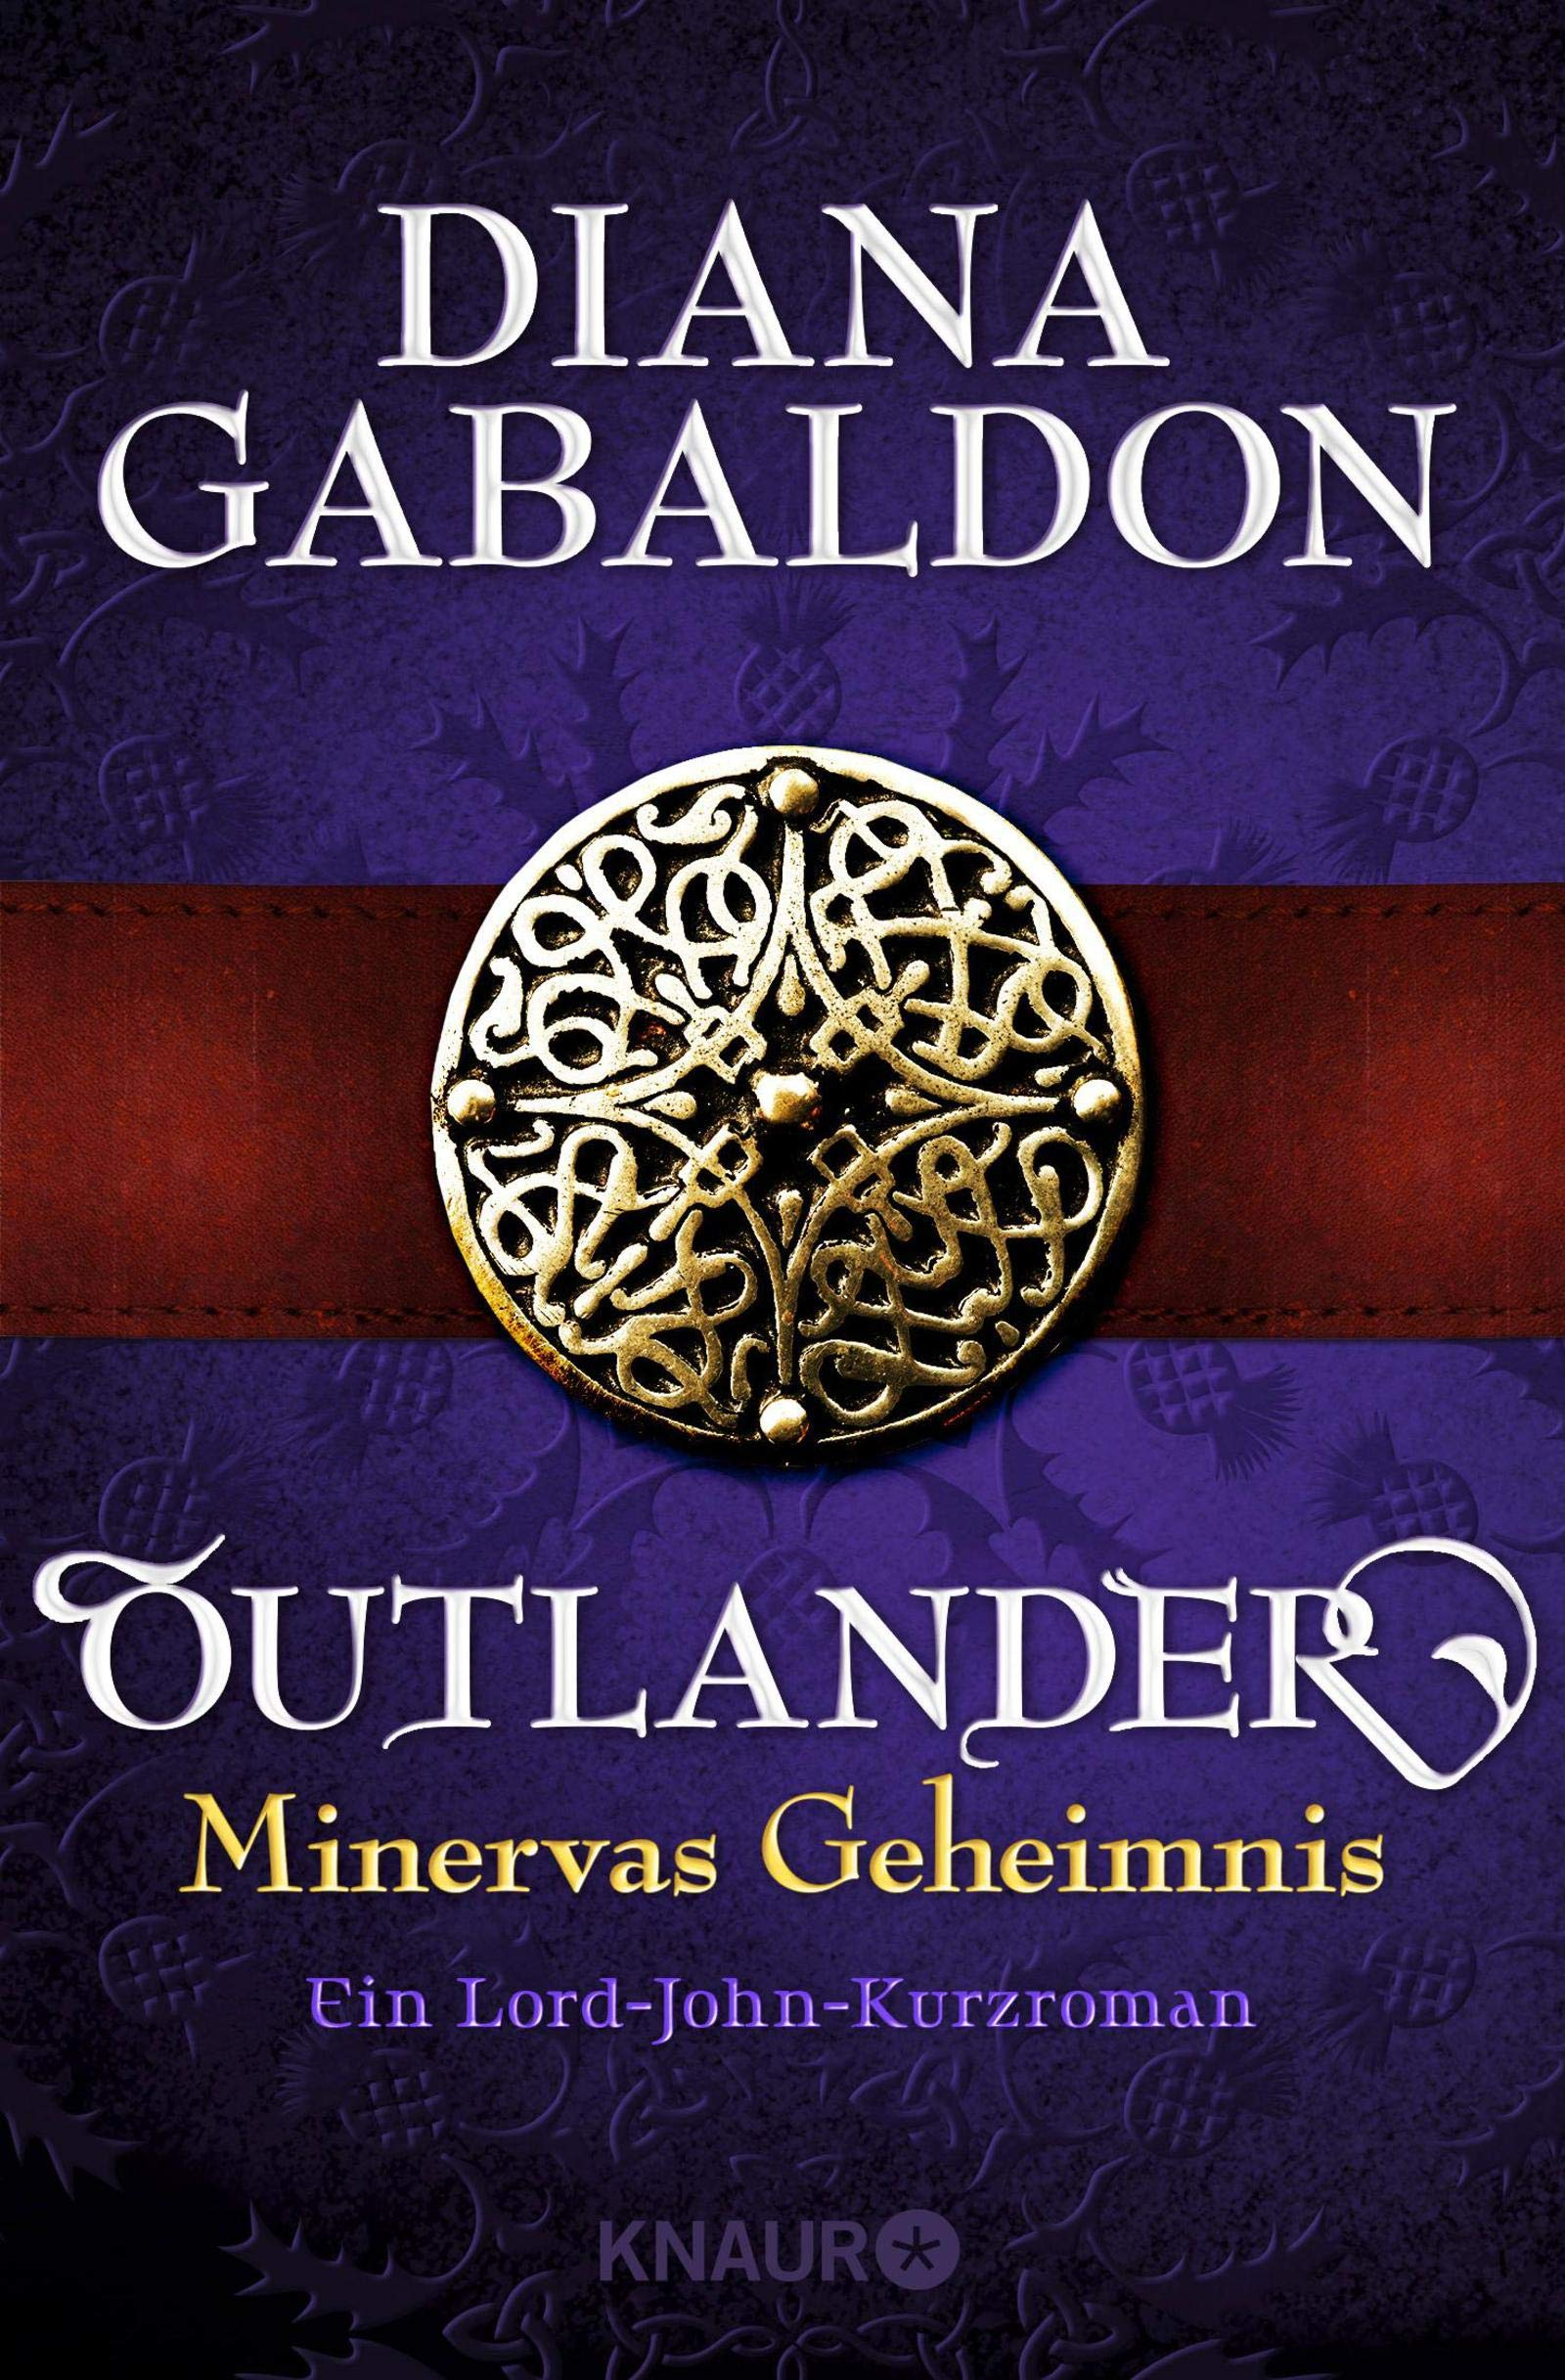 Outlander   Minervas Geheimnis  Ein Lord John Kurzroman